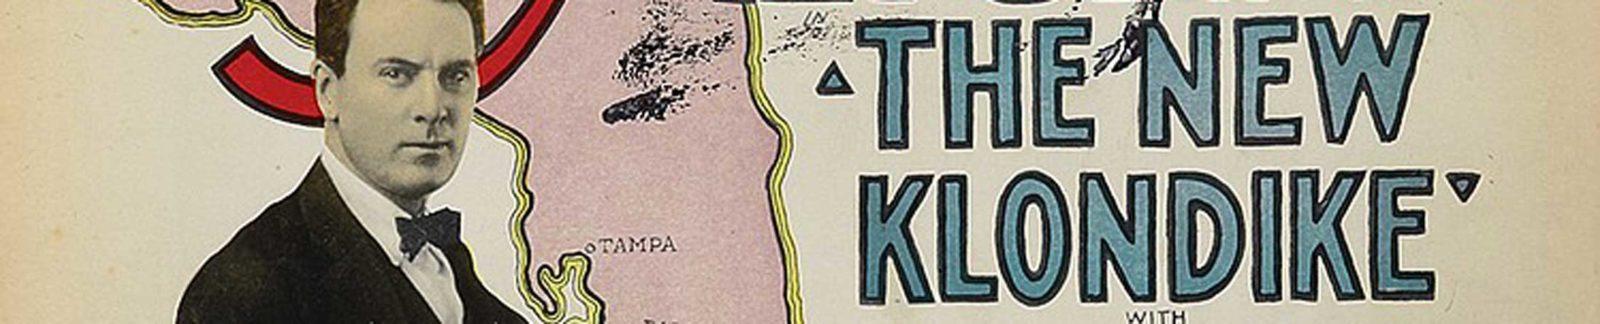 The New Klondike - header